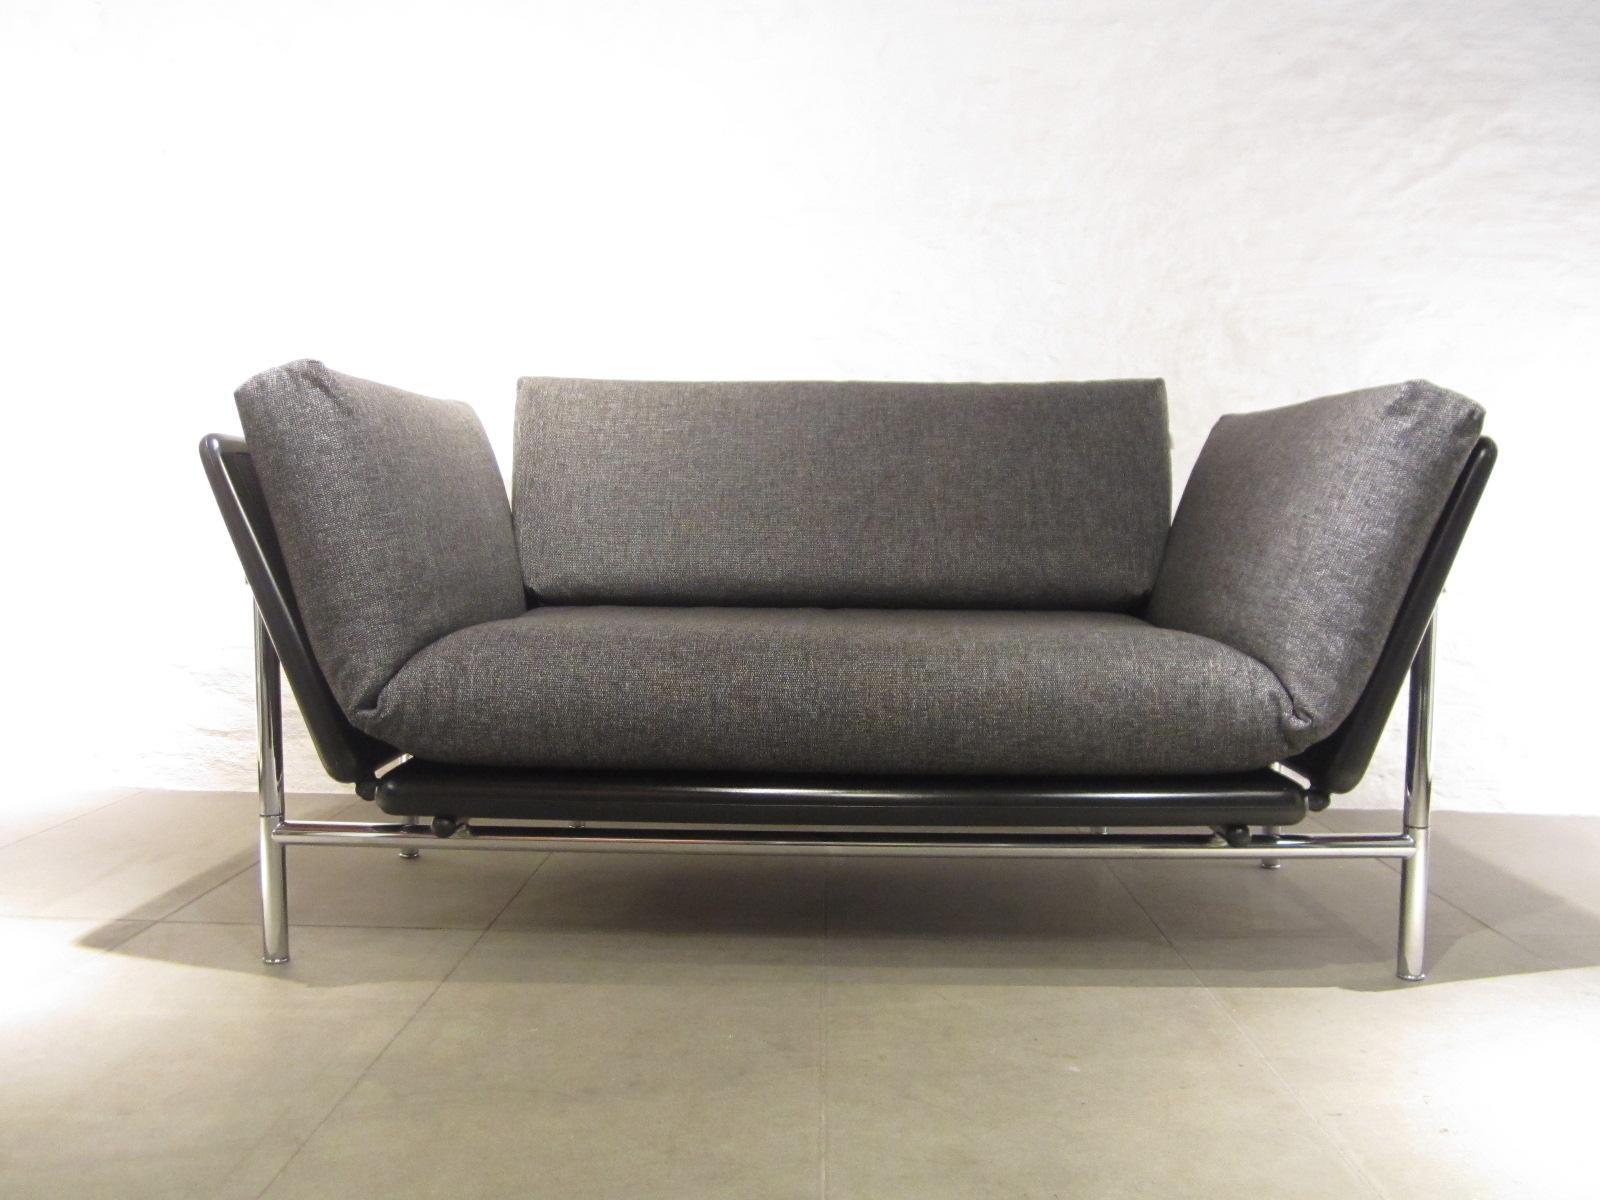 rataplan sofa daybed. Black Bedroom Furniture Sets. Home Design Ideas